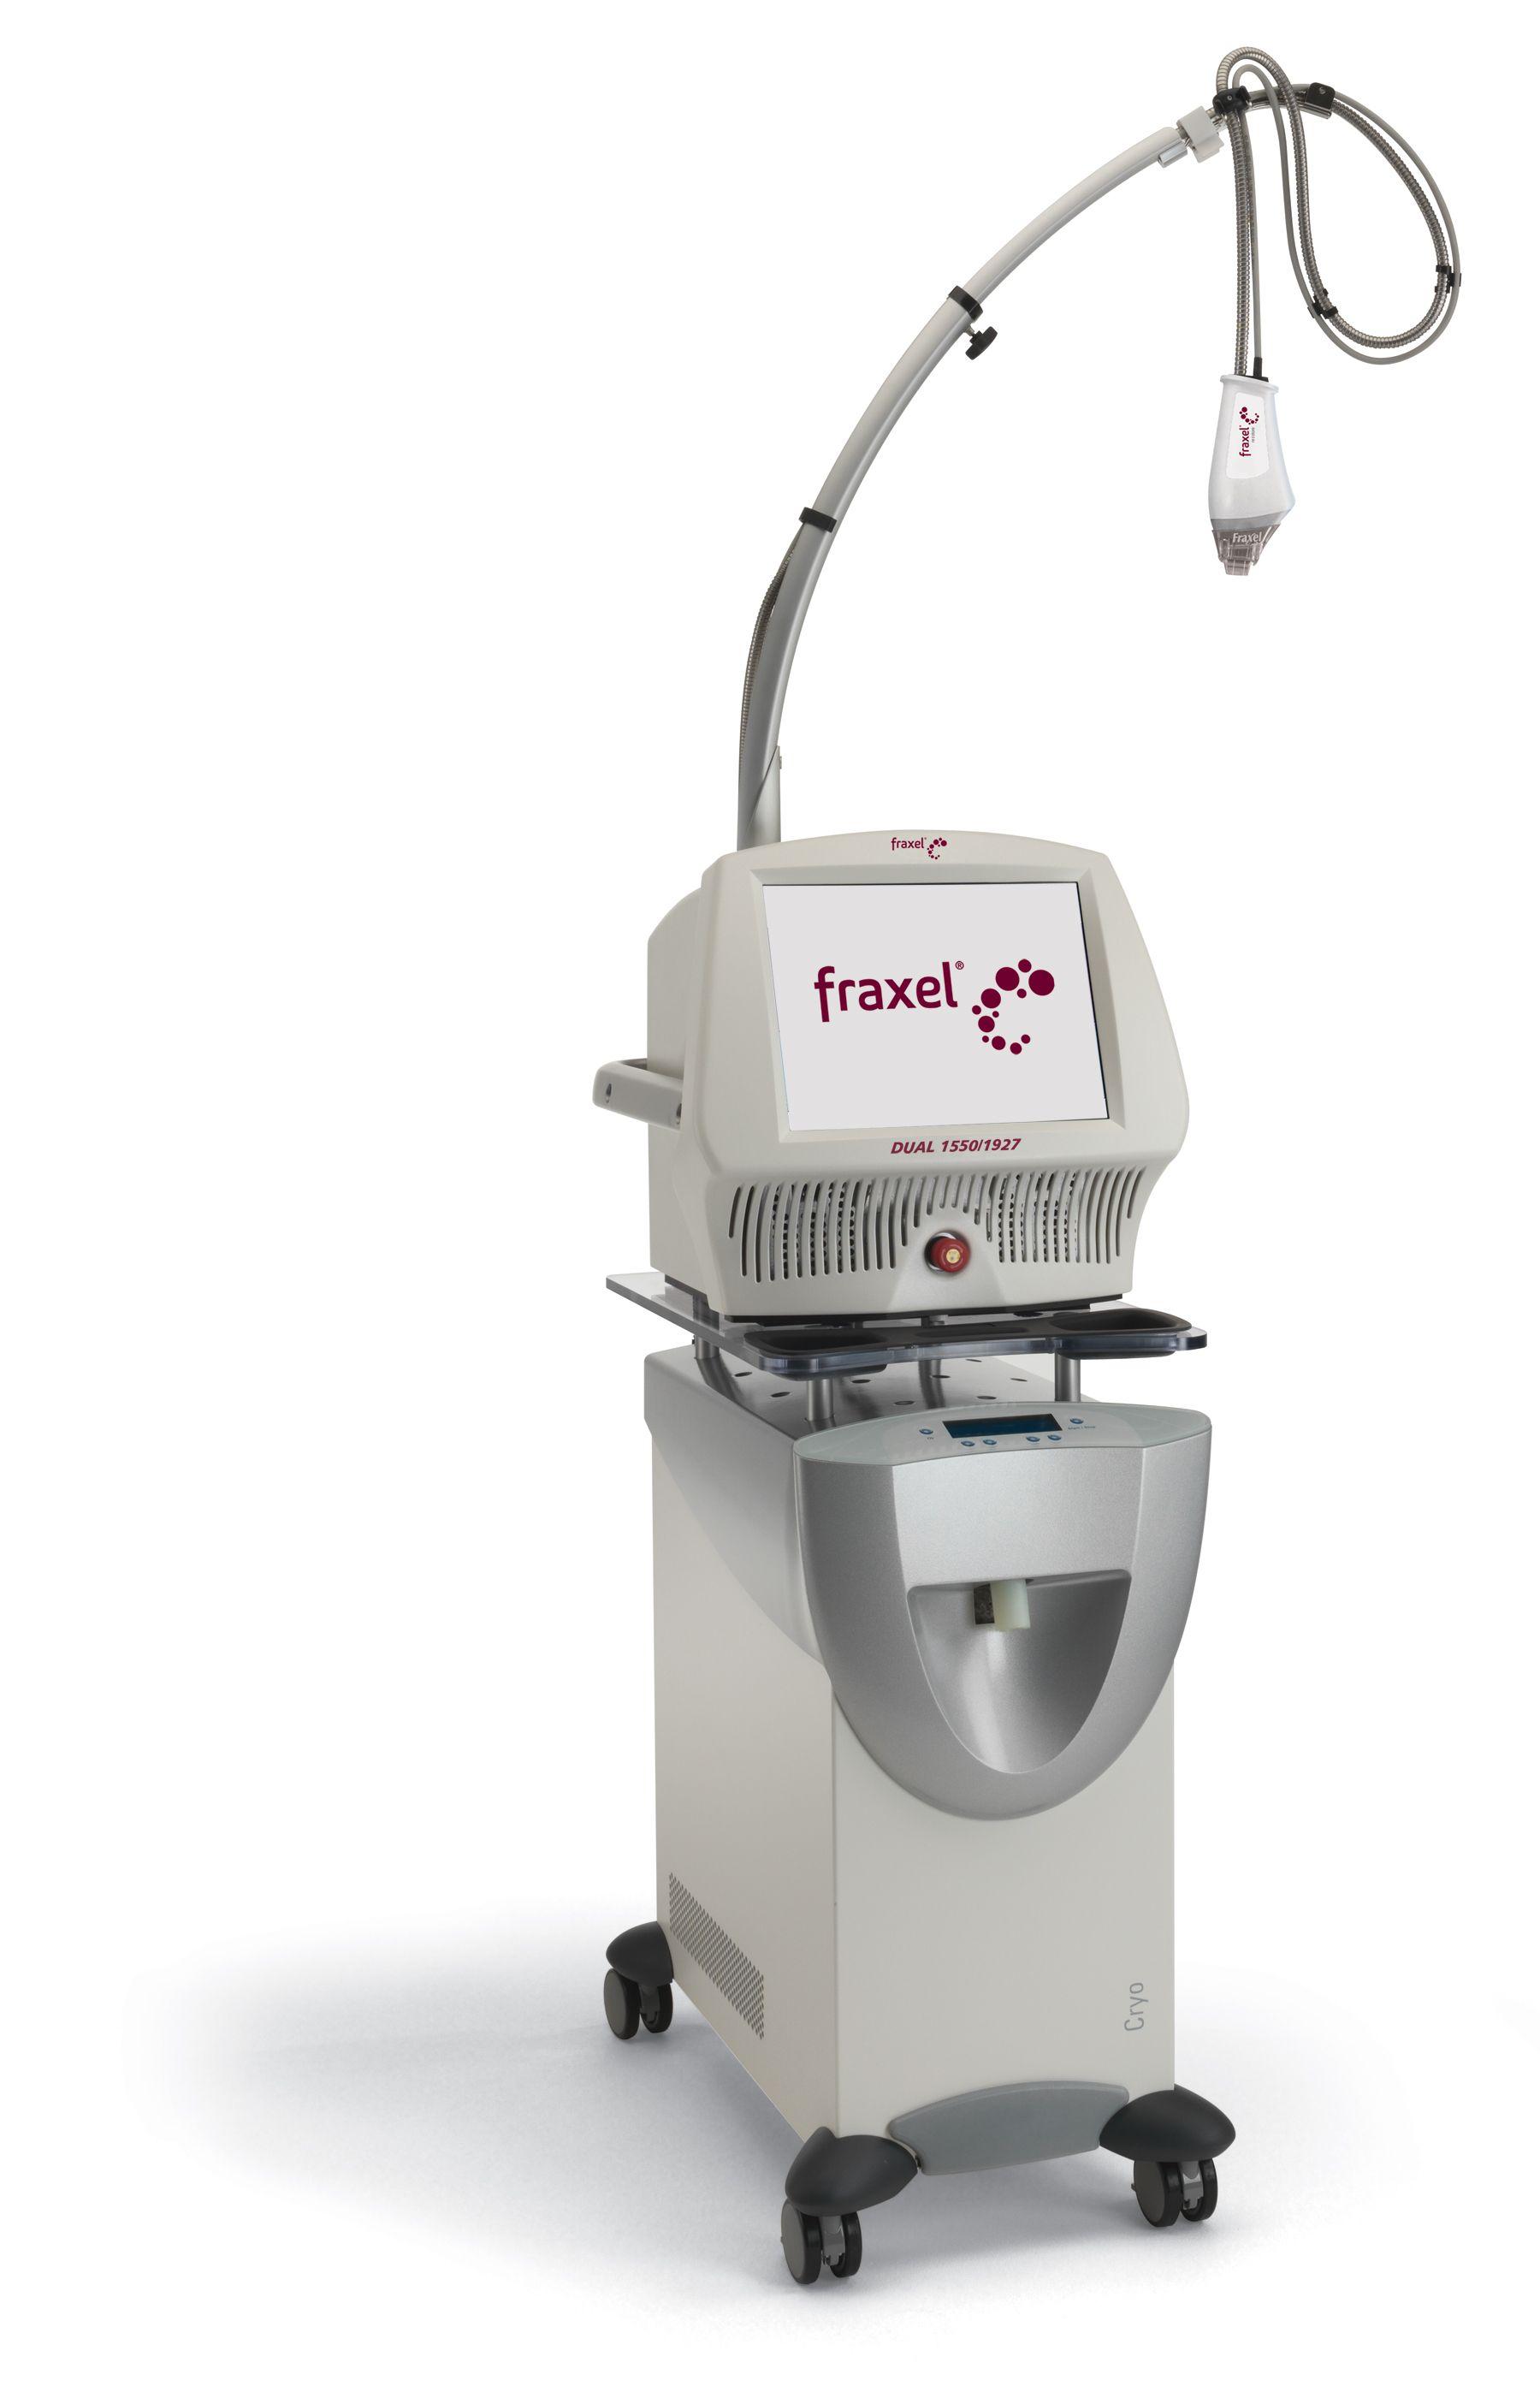 Fraxel Laser Skin Resurfacing New Image Medspa Keratosis Pilaris Laser Skin Treatment Keratosis Pilaris Treatment